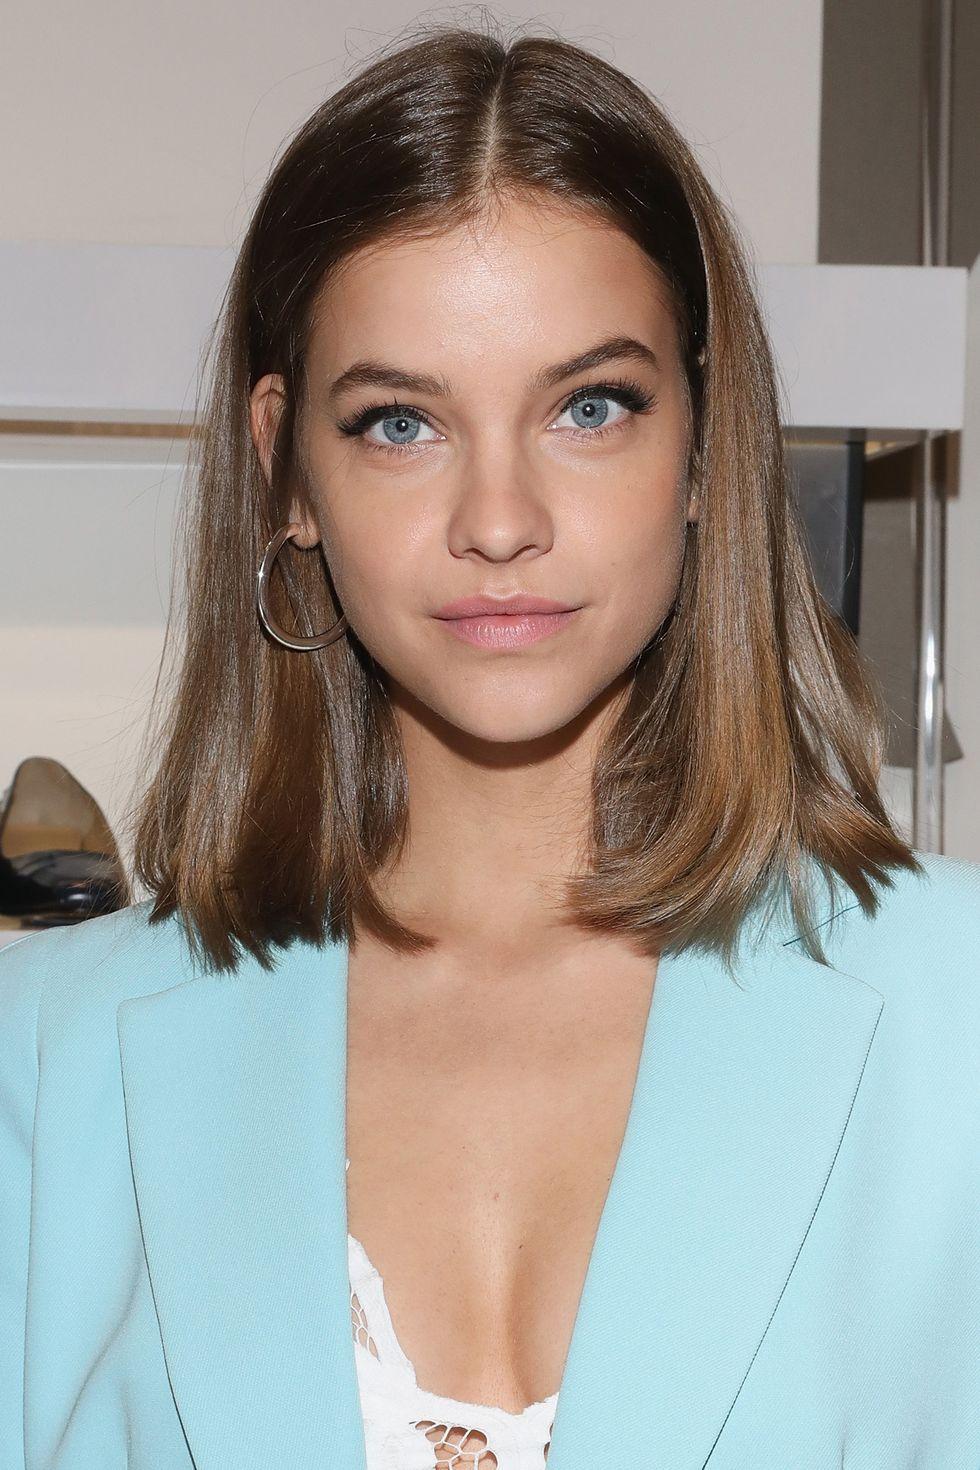 Barbara Palvin Critiques 10 Of Her Most Memorable Beauty Looks In 2020 Hair Lengths Medium Hair Styles Aesthetic Hair